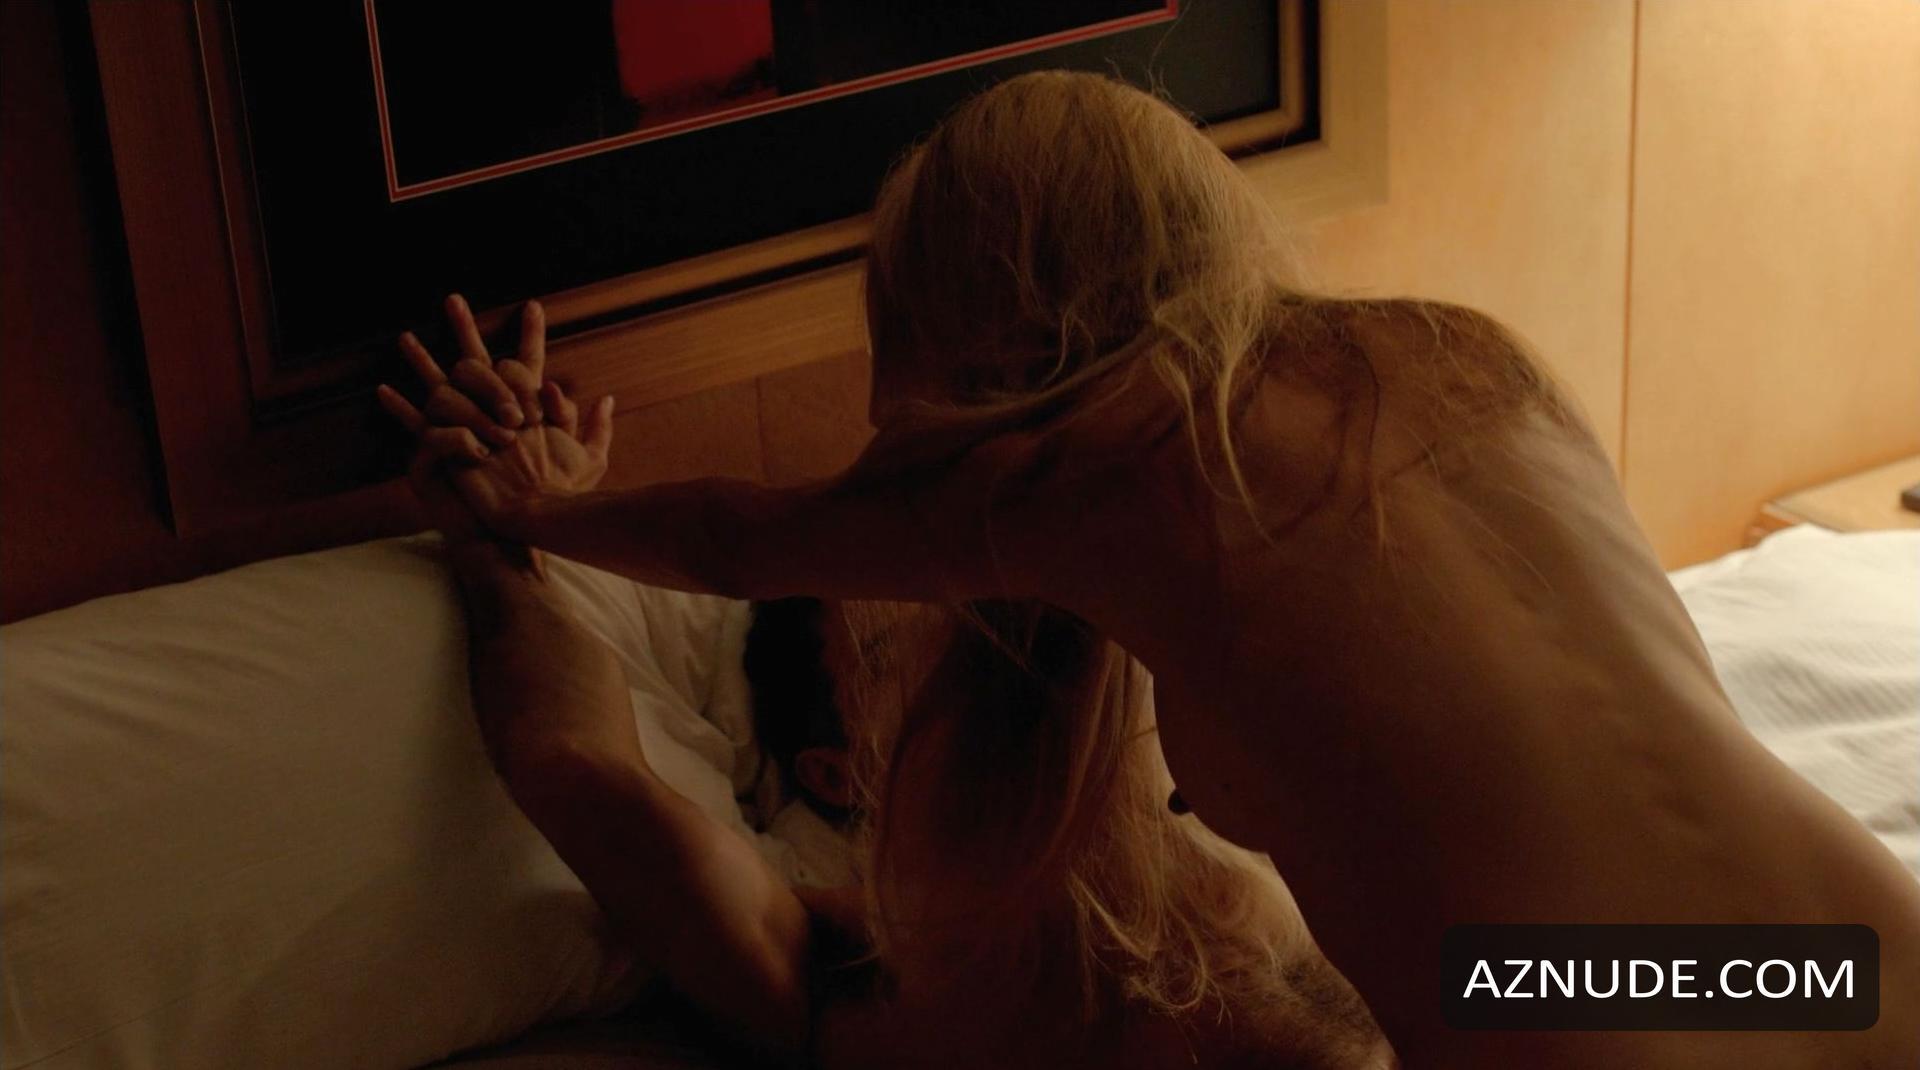 Anne hathaway nude movies list-9629